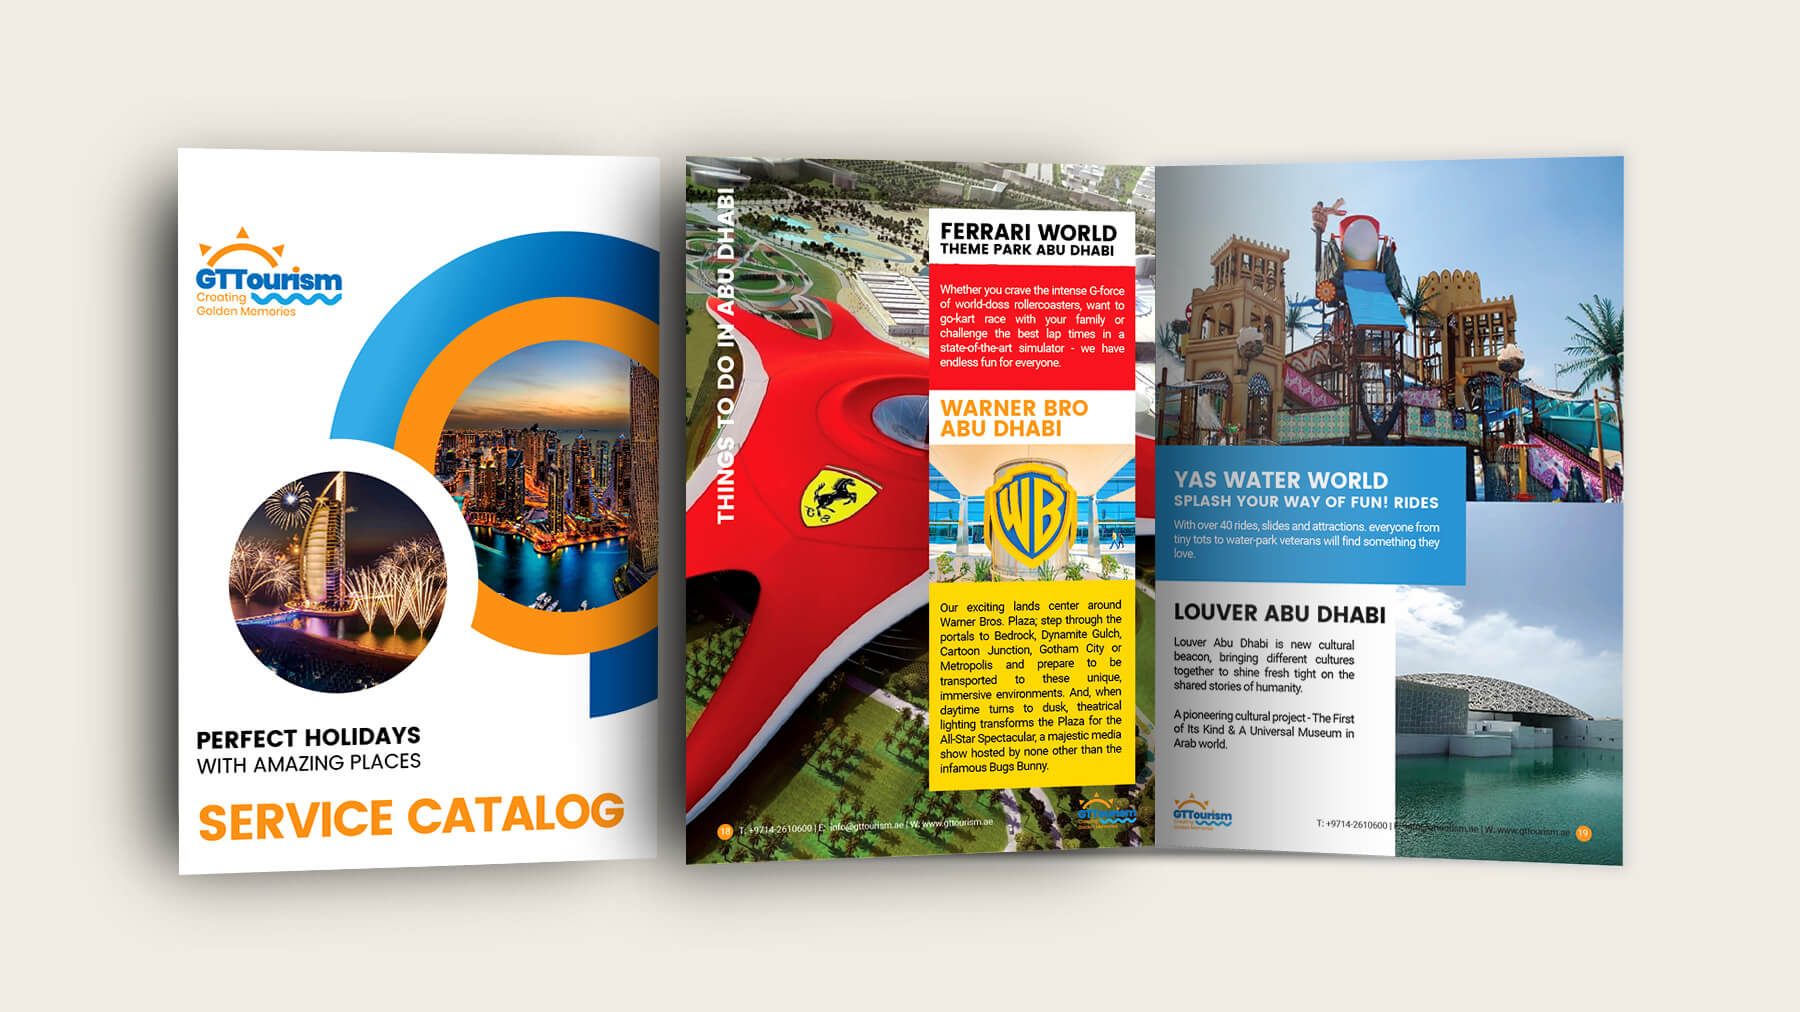 Kerala Freelance Service Catalog Design for Golden Talent Tourism, Dubai, United Arab Emirates